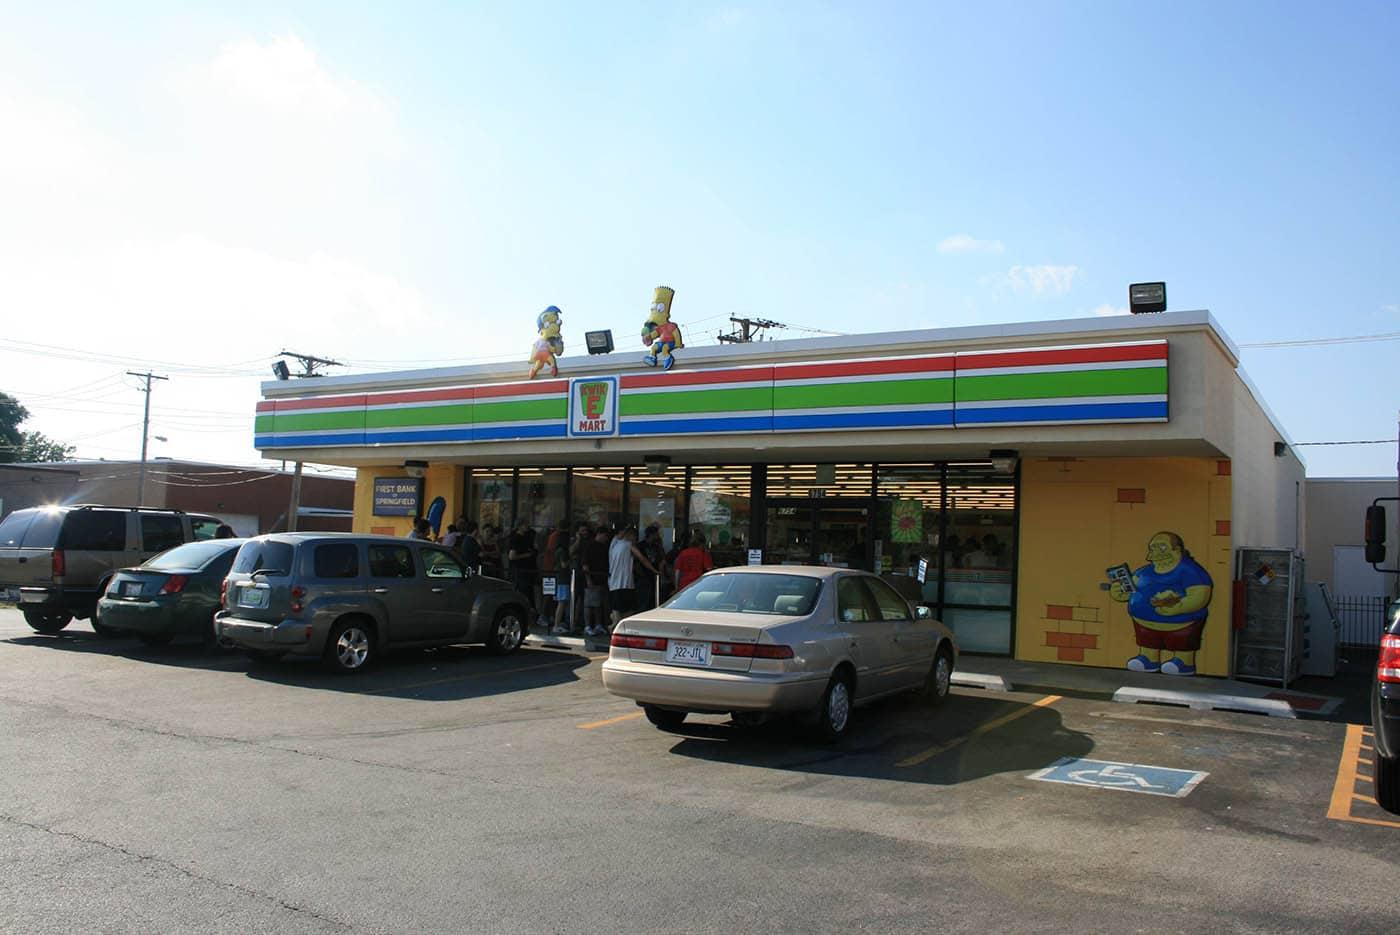 The Simpsons 7-Eleven Kwik-E-Mart in Chicago, Illinois.